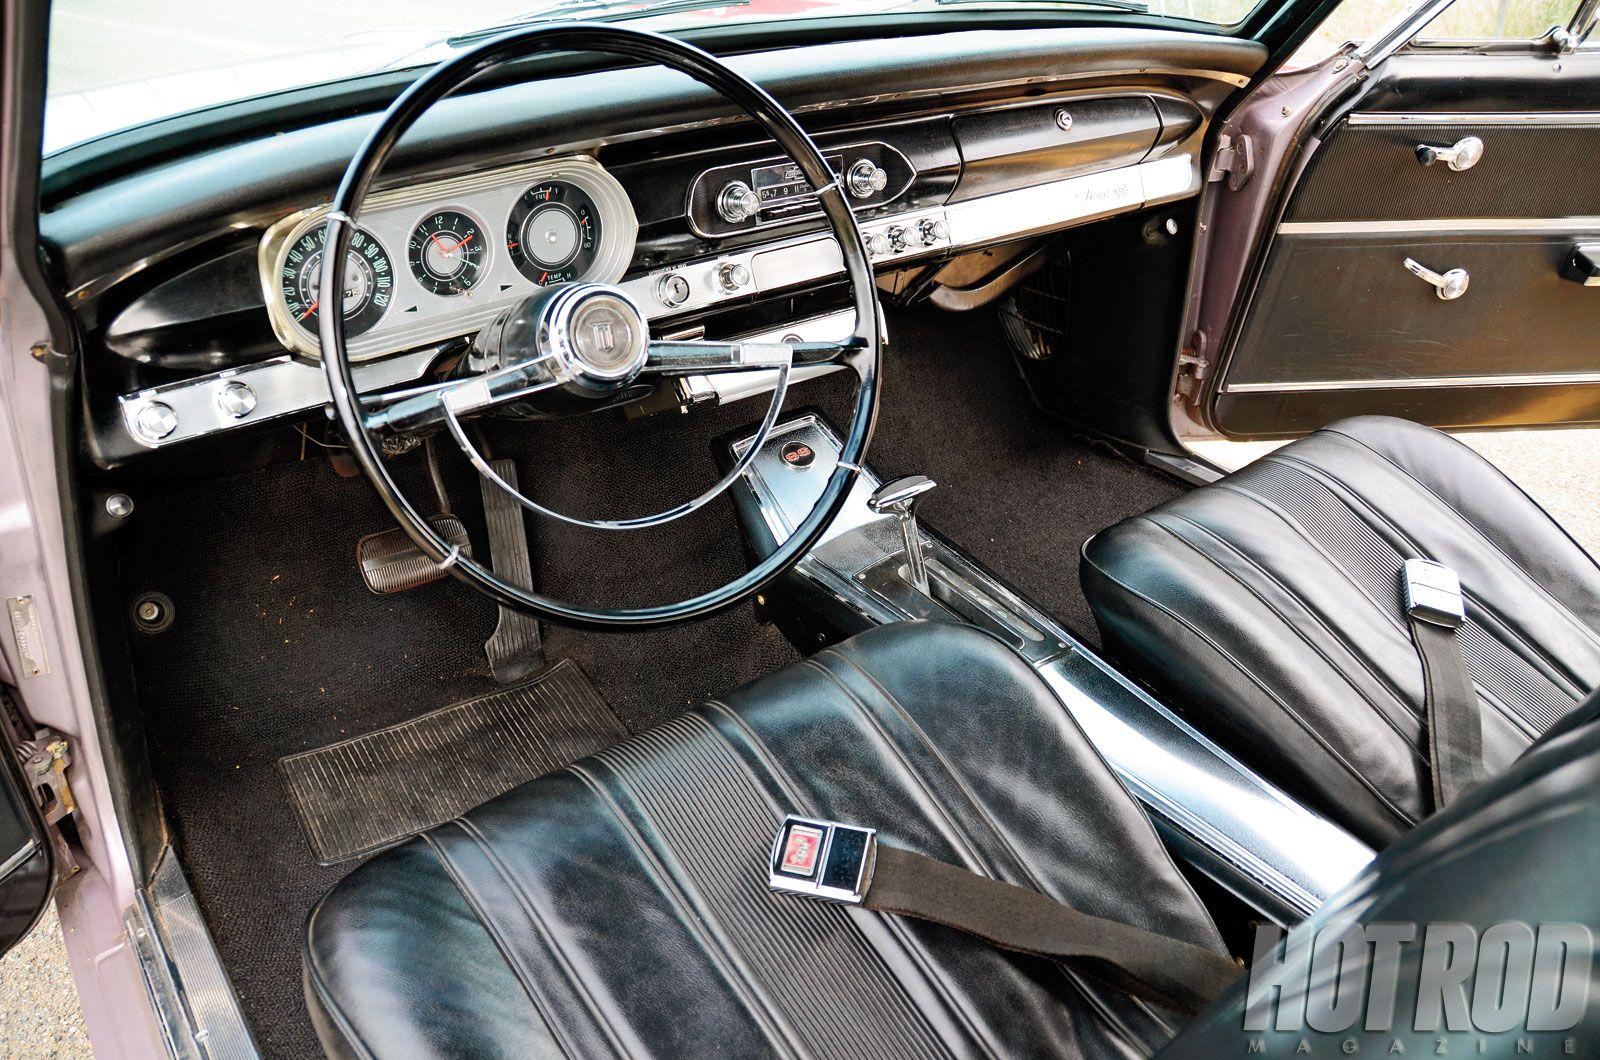 1965 chevy ii nova ss favorite cars american muscle pinterest - 1965 Chevy 2 Nova Super Sport Mscp 1110 1965 Chevy Nova Super Sport 04